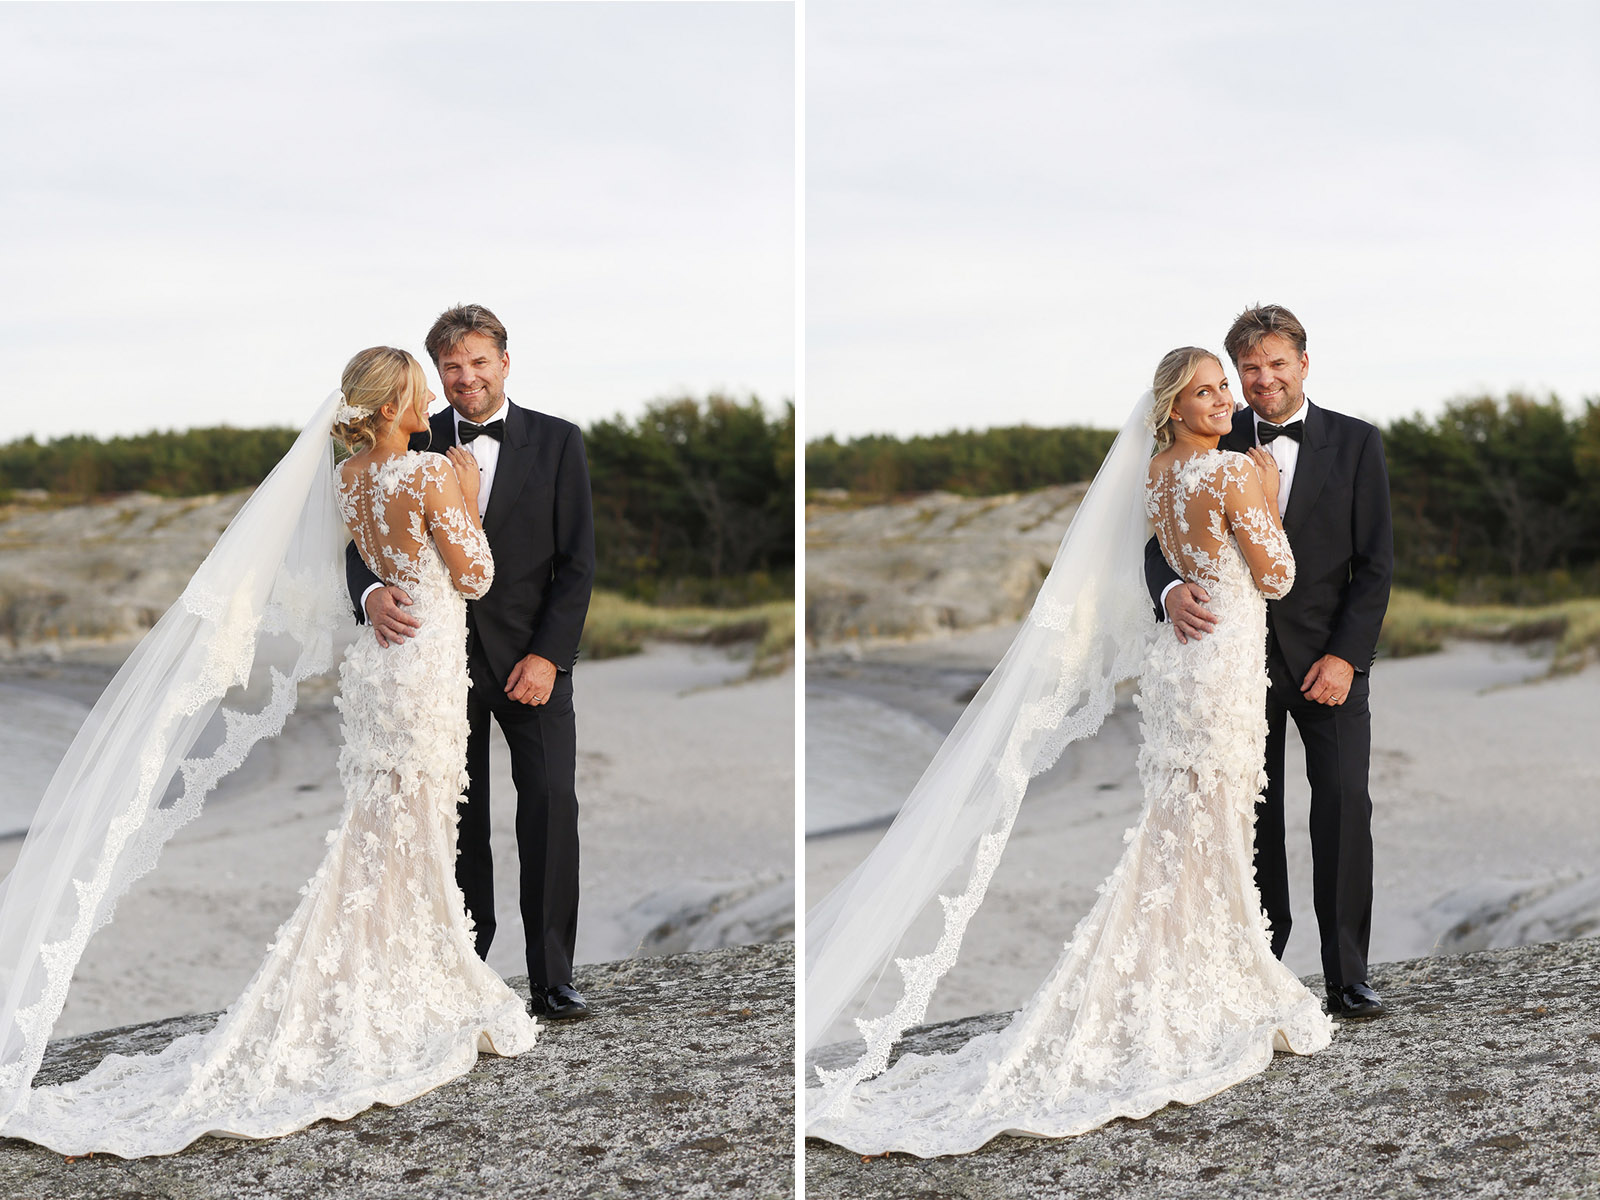 65 Støtvig hotel bryllup